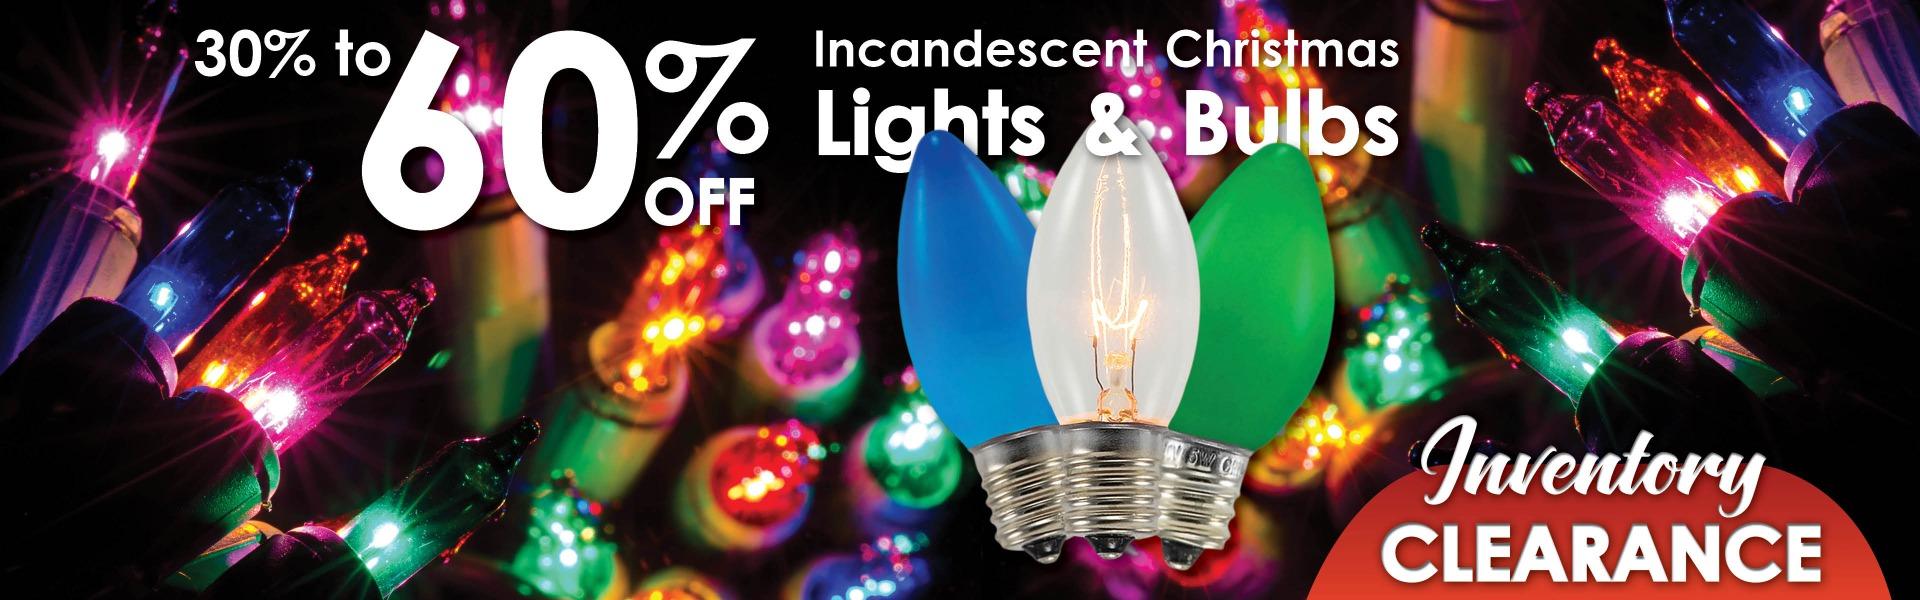 Incandescent Christmas Light Sale